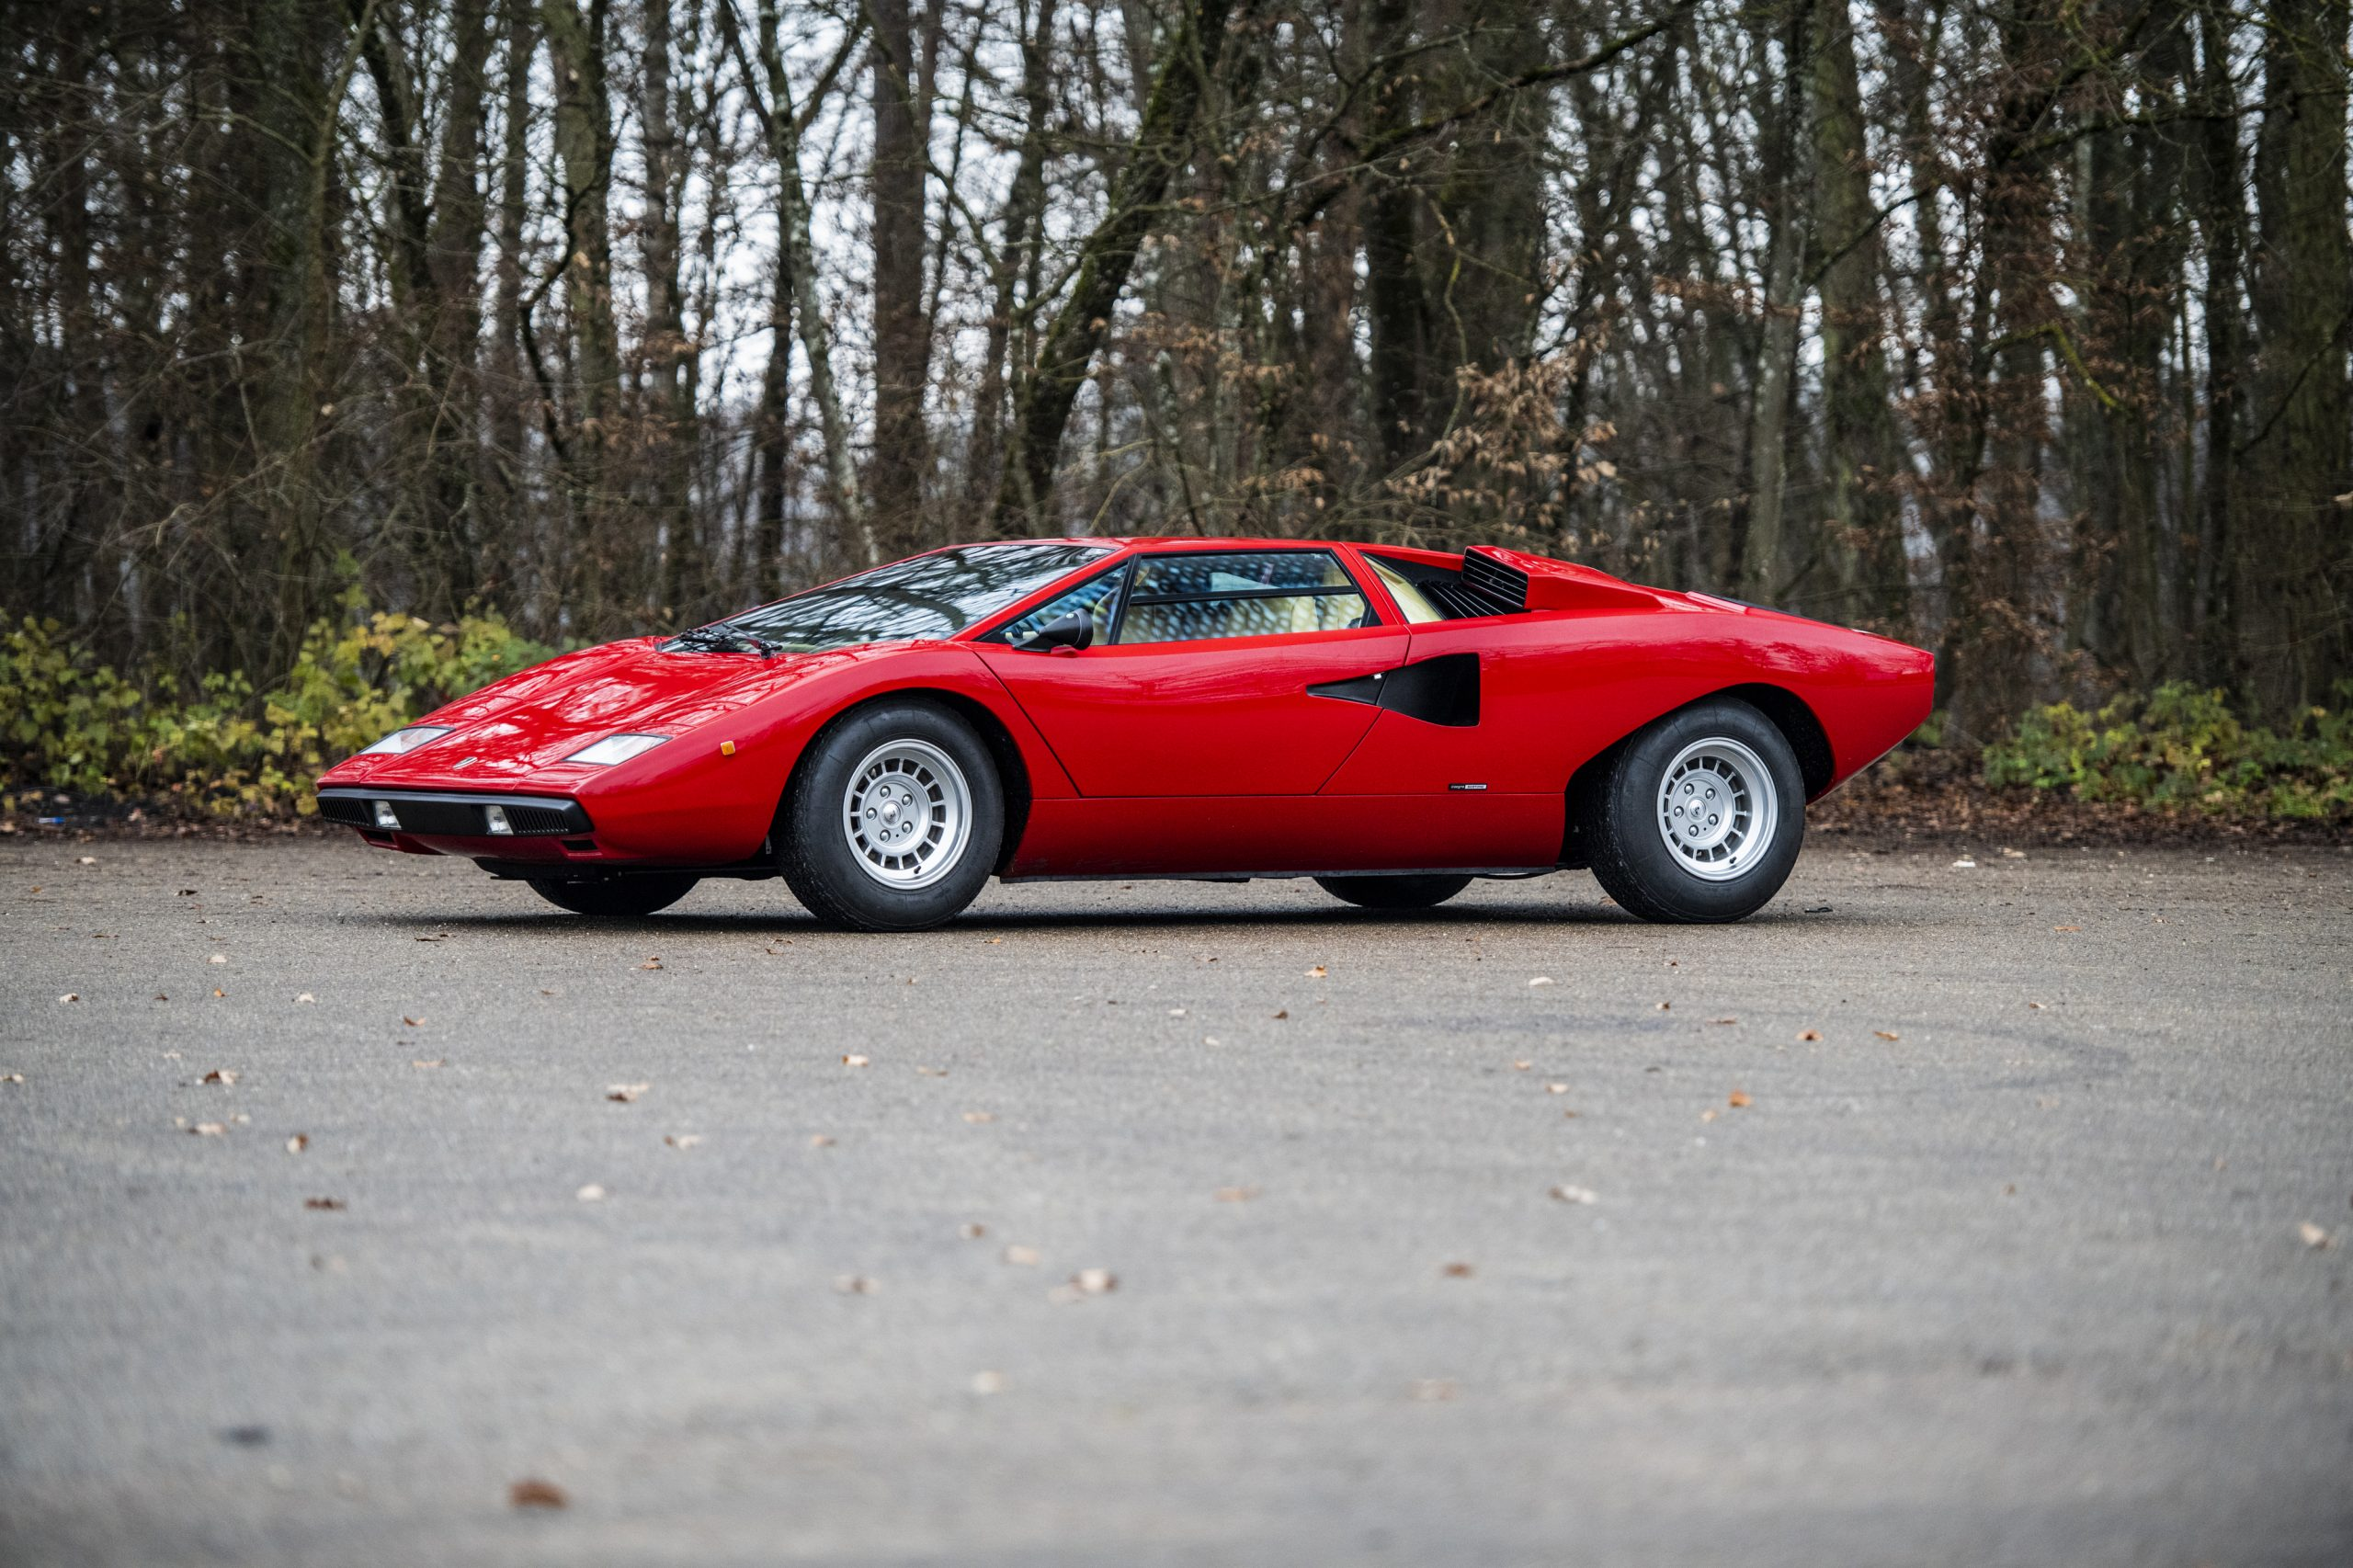 1977 Lamborghini Countach LP400 Periscopio front three-quarter